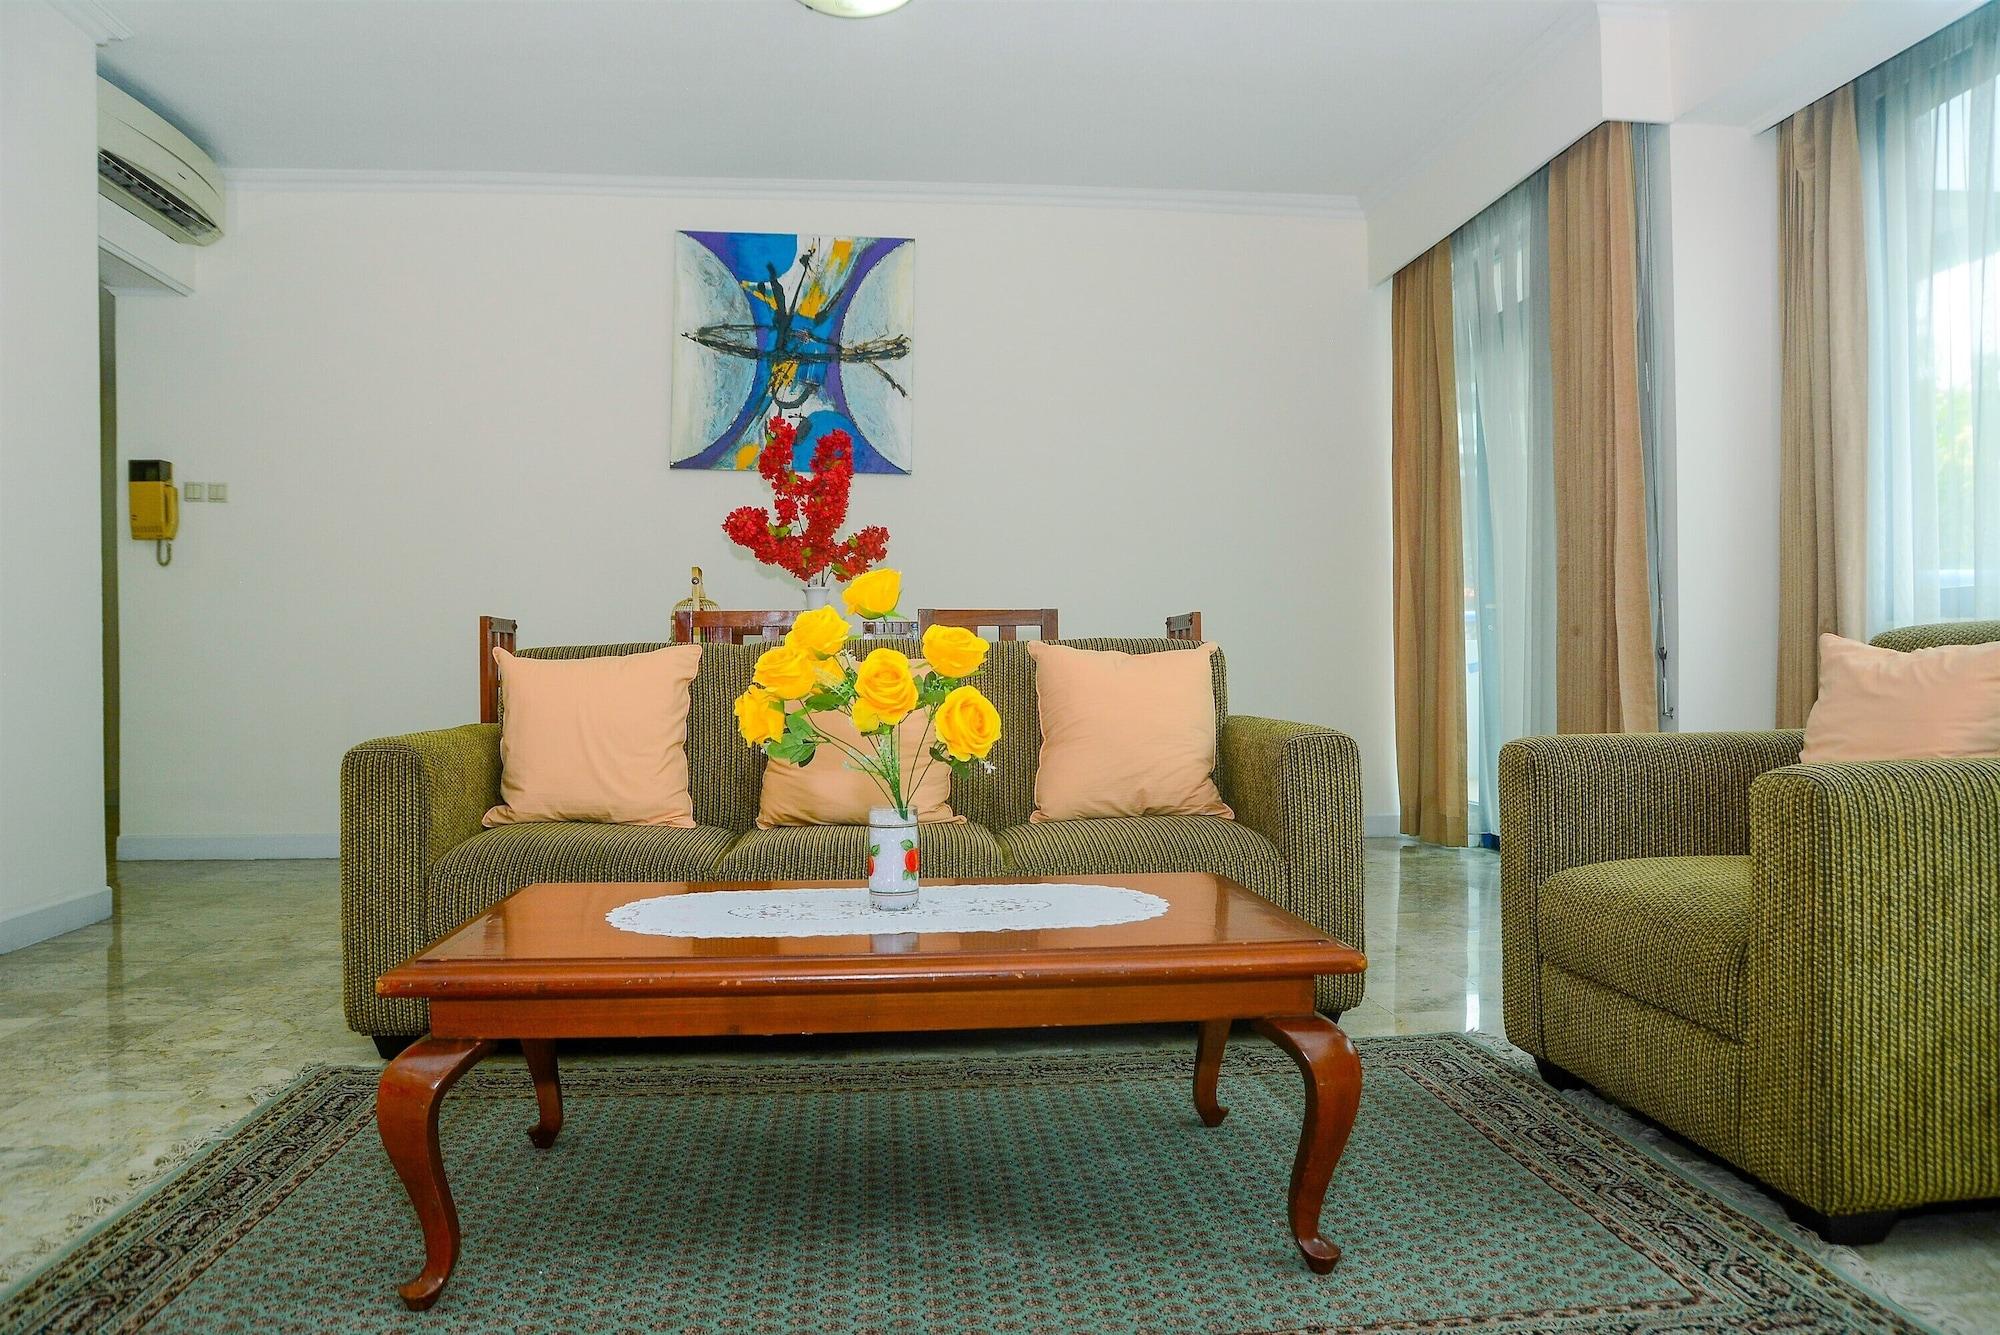 Spacious 3BR Prapanca Apartment near Lippo Mall Kemang, South Jakarta